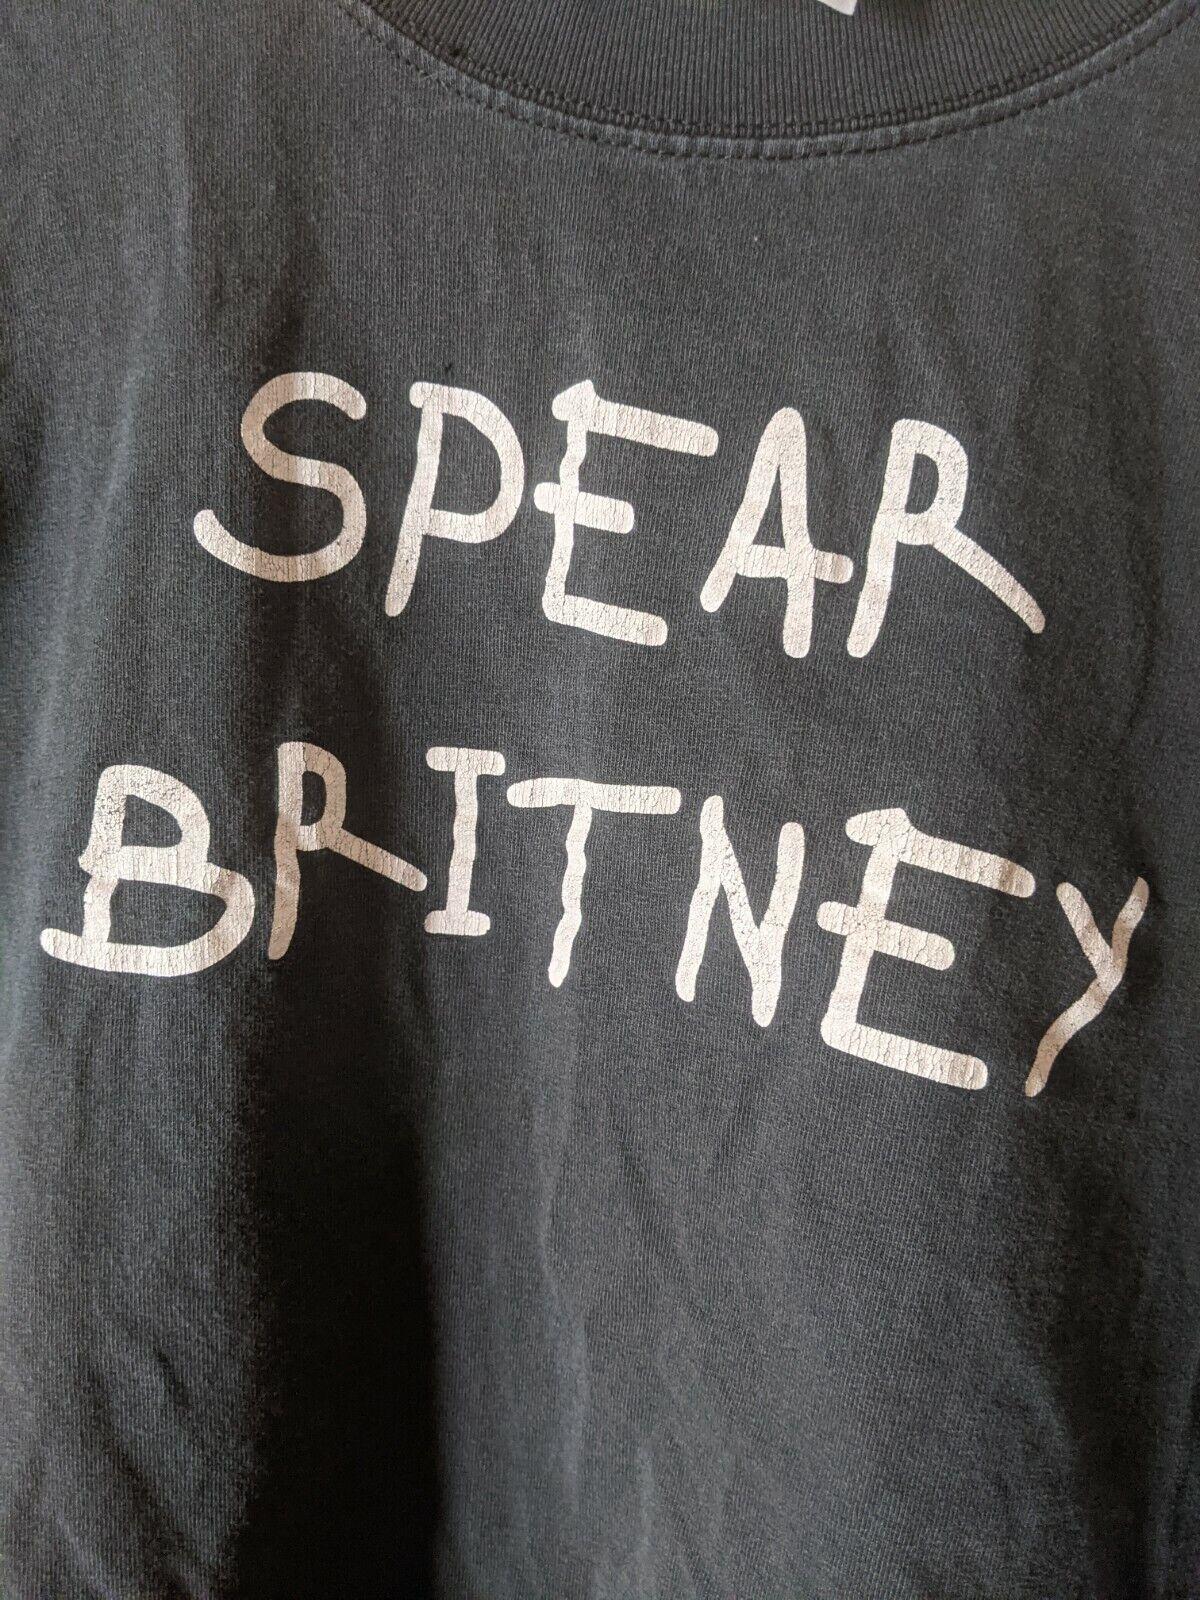 Spear Britney Anti Britney Spears Shirt Medium Vi… - image 1